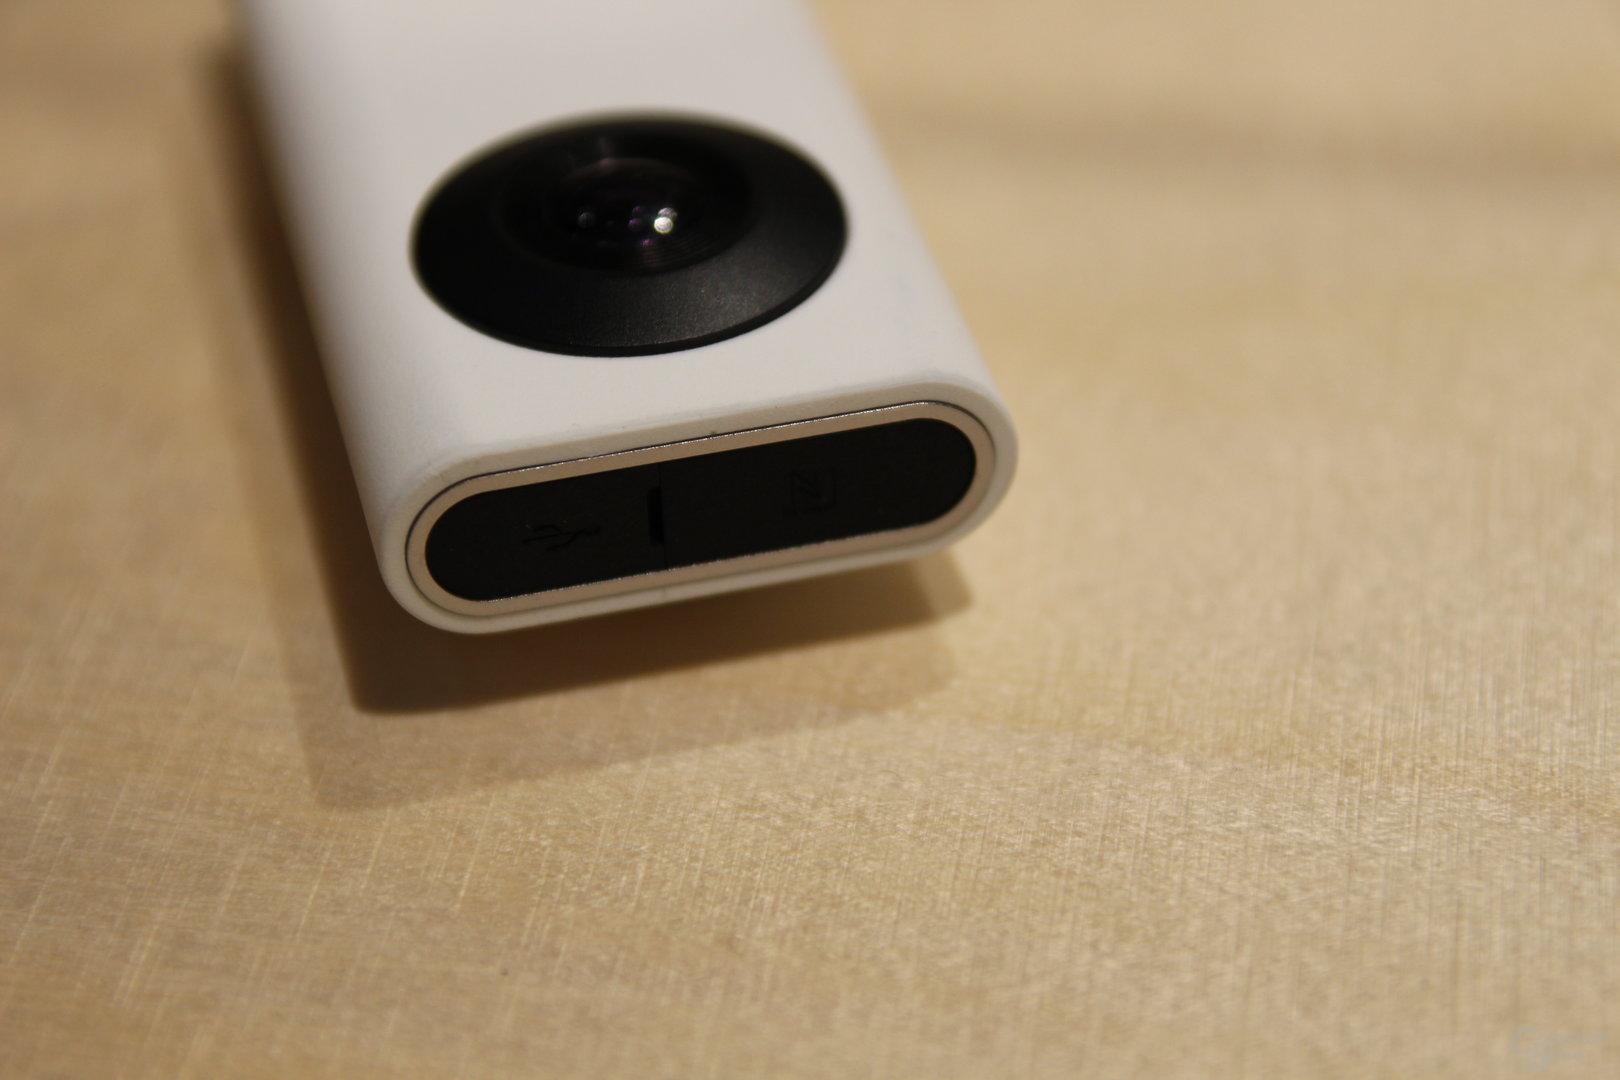 Sony Xperia Eye